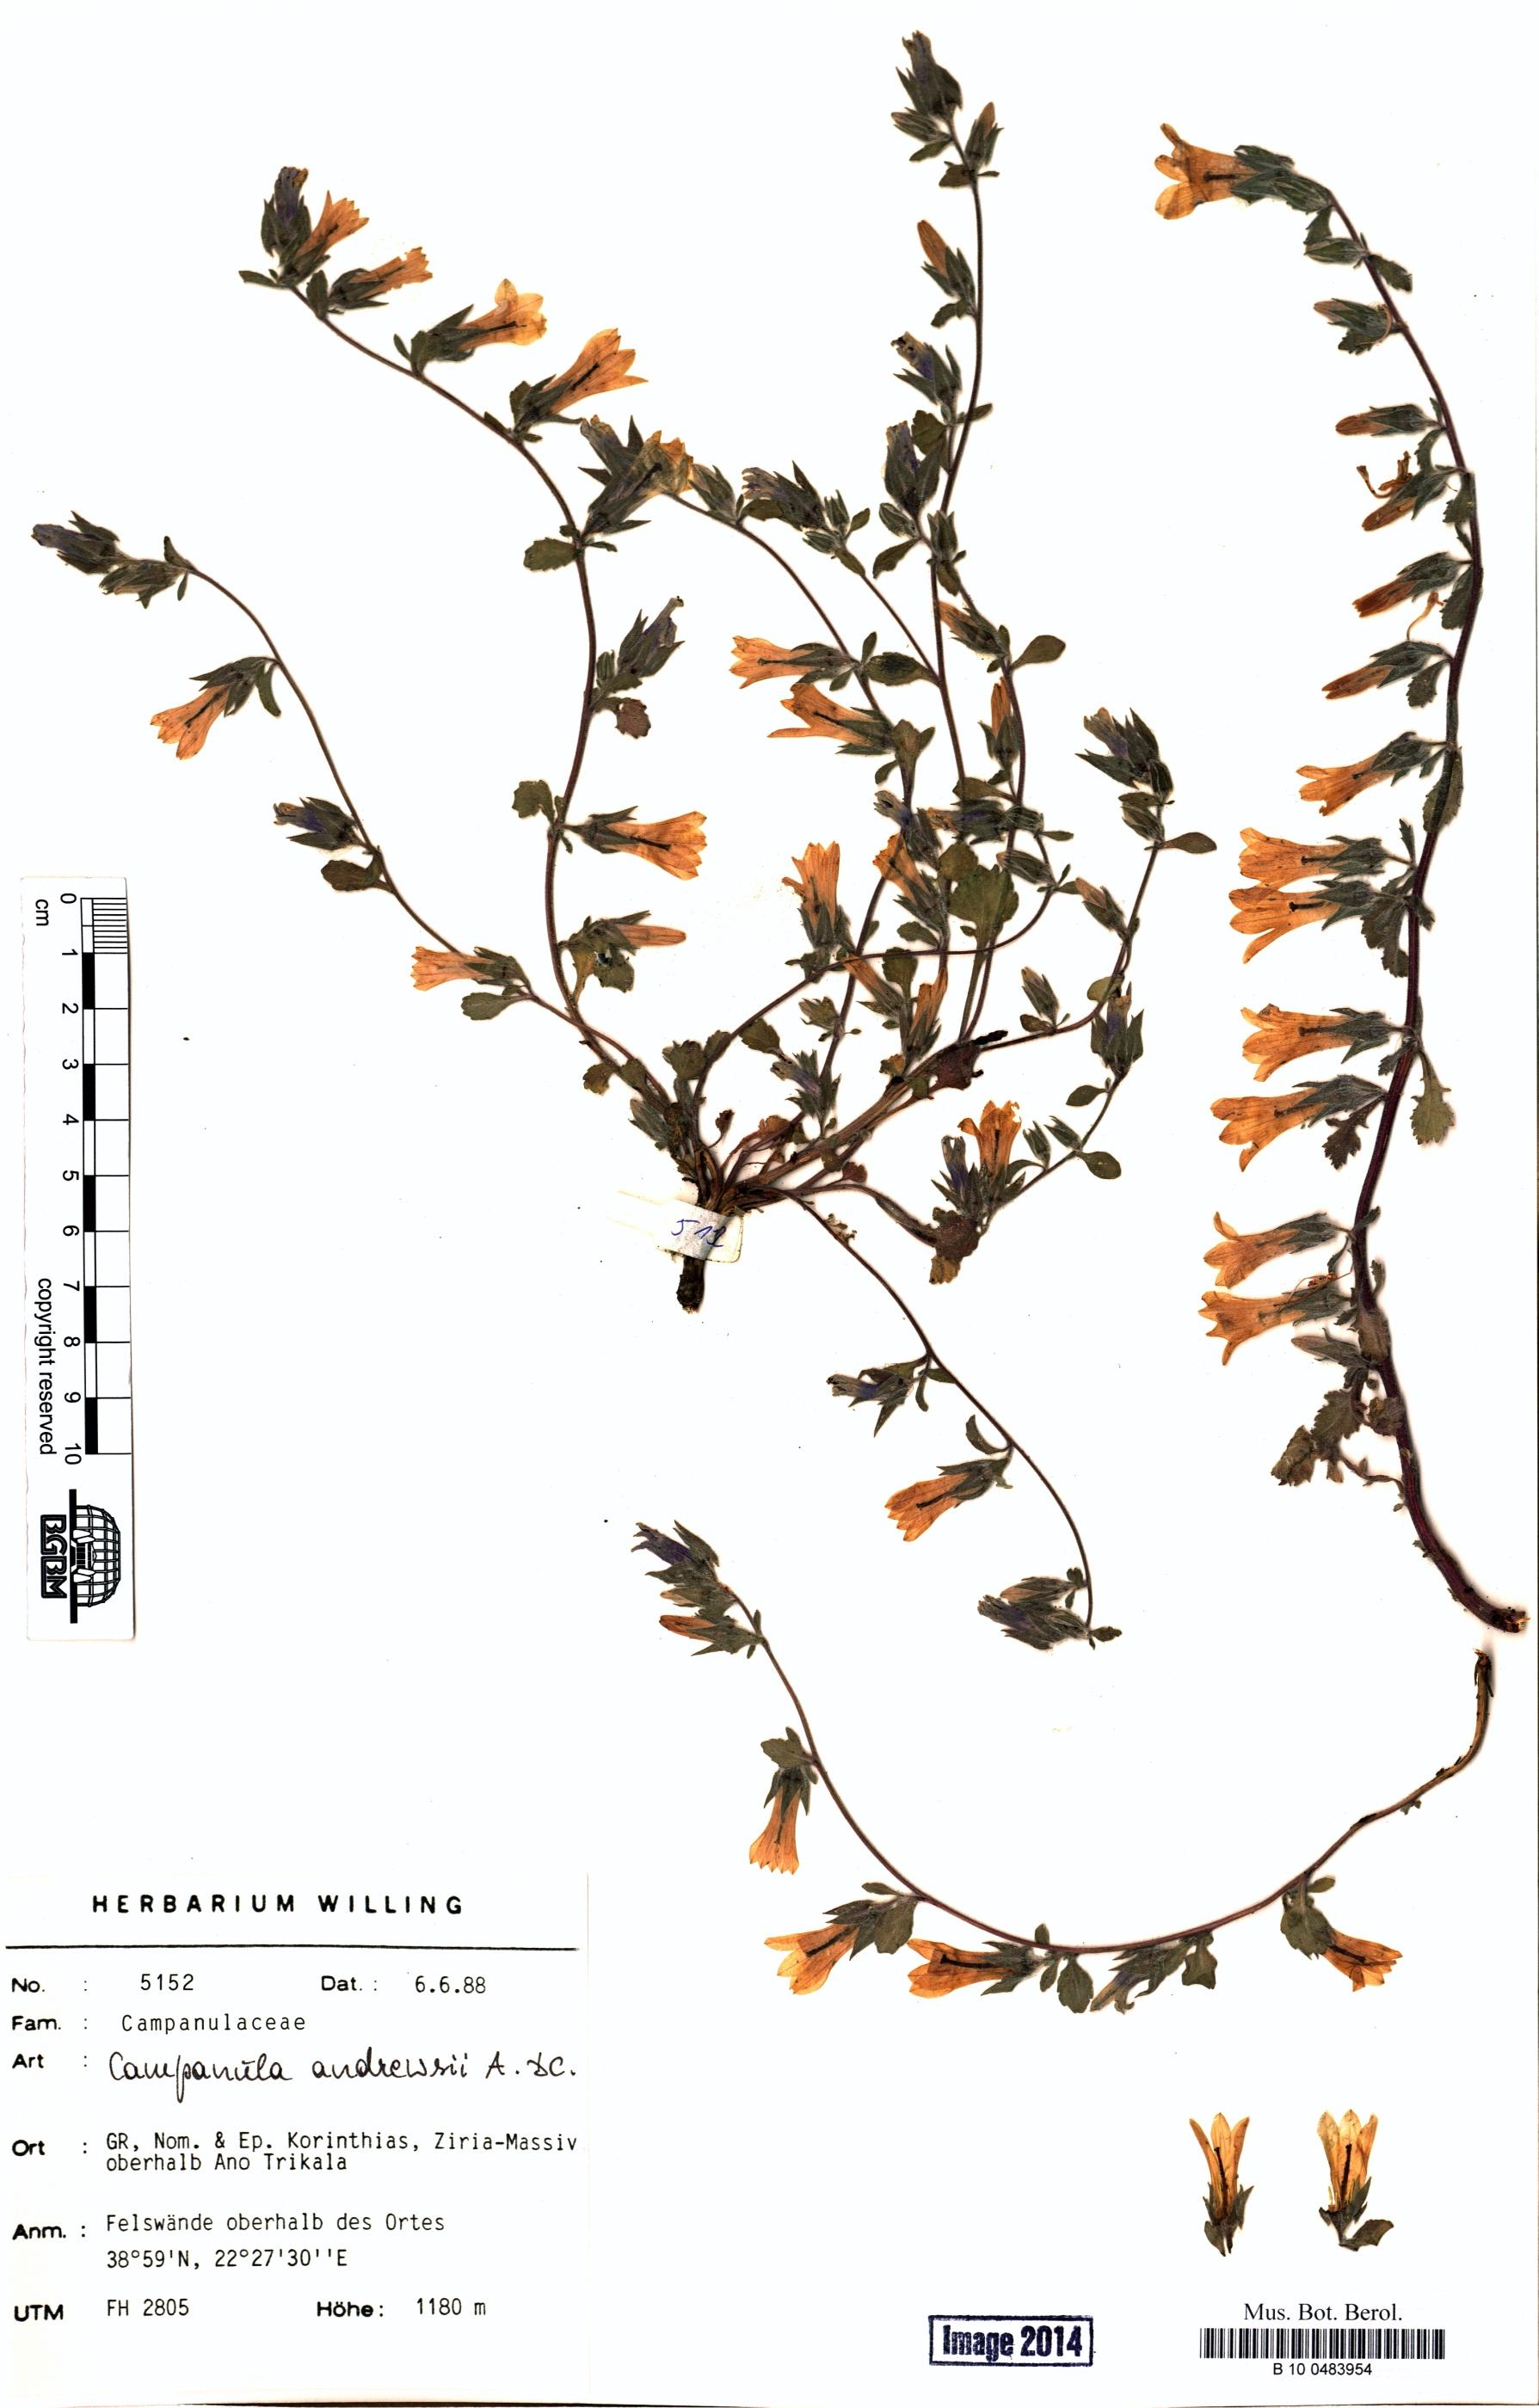 http://ww2.bgbm.org/herbarium/images/B/10/04/83/95/B_10_0483954.jpg